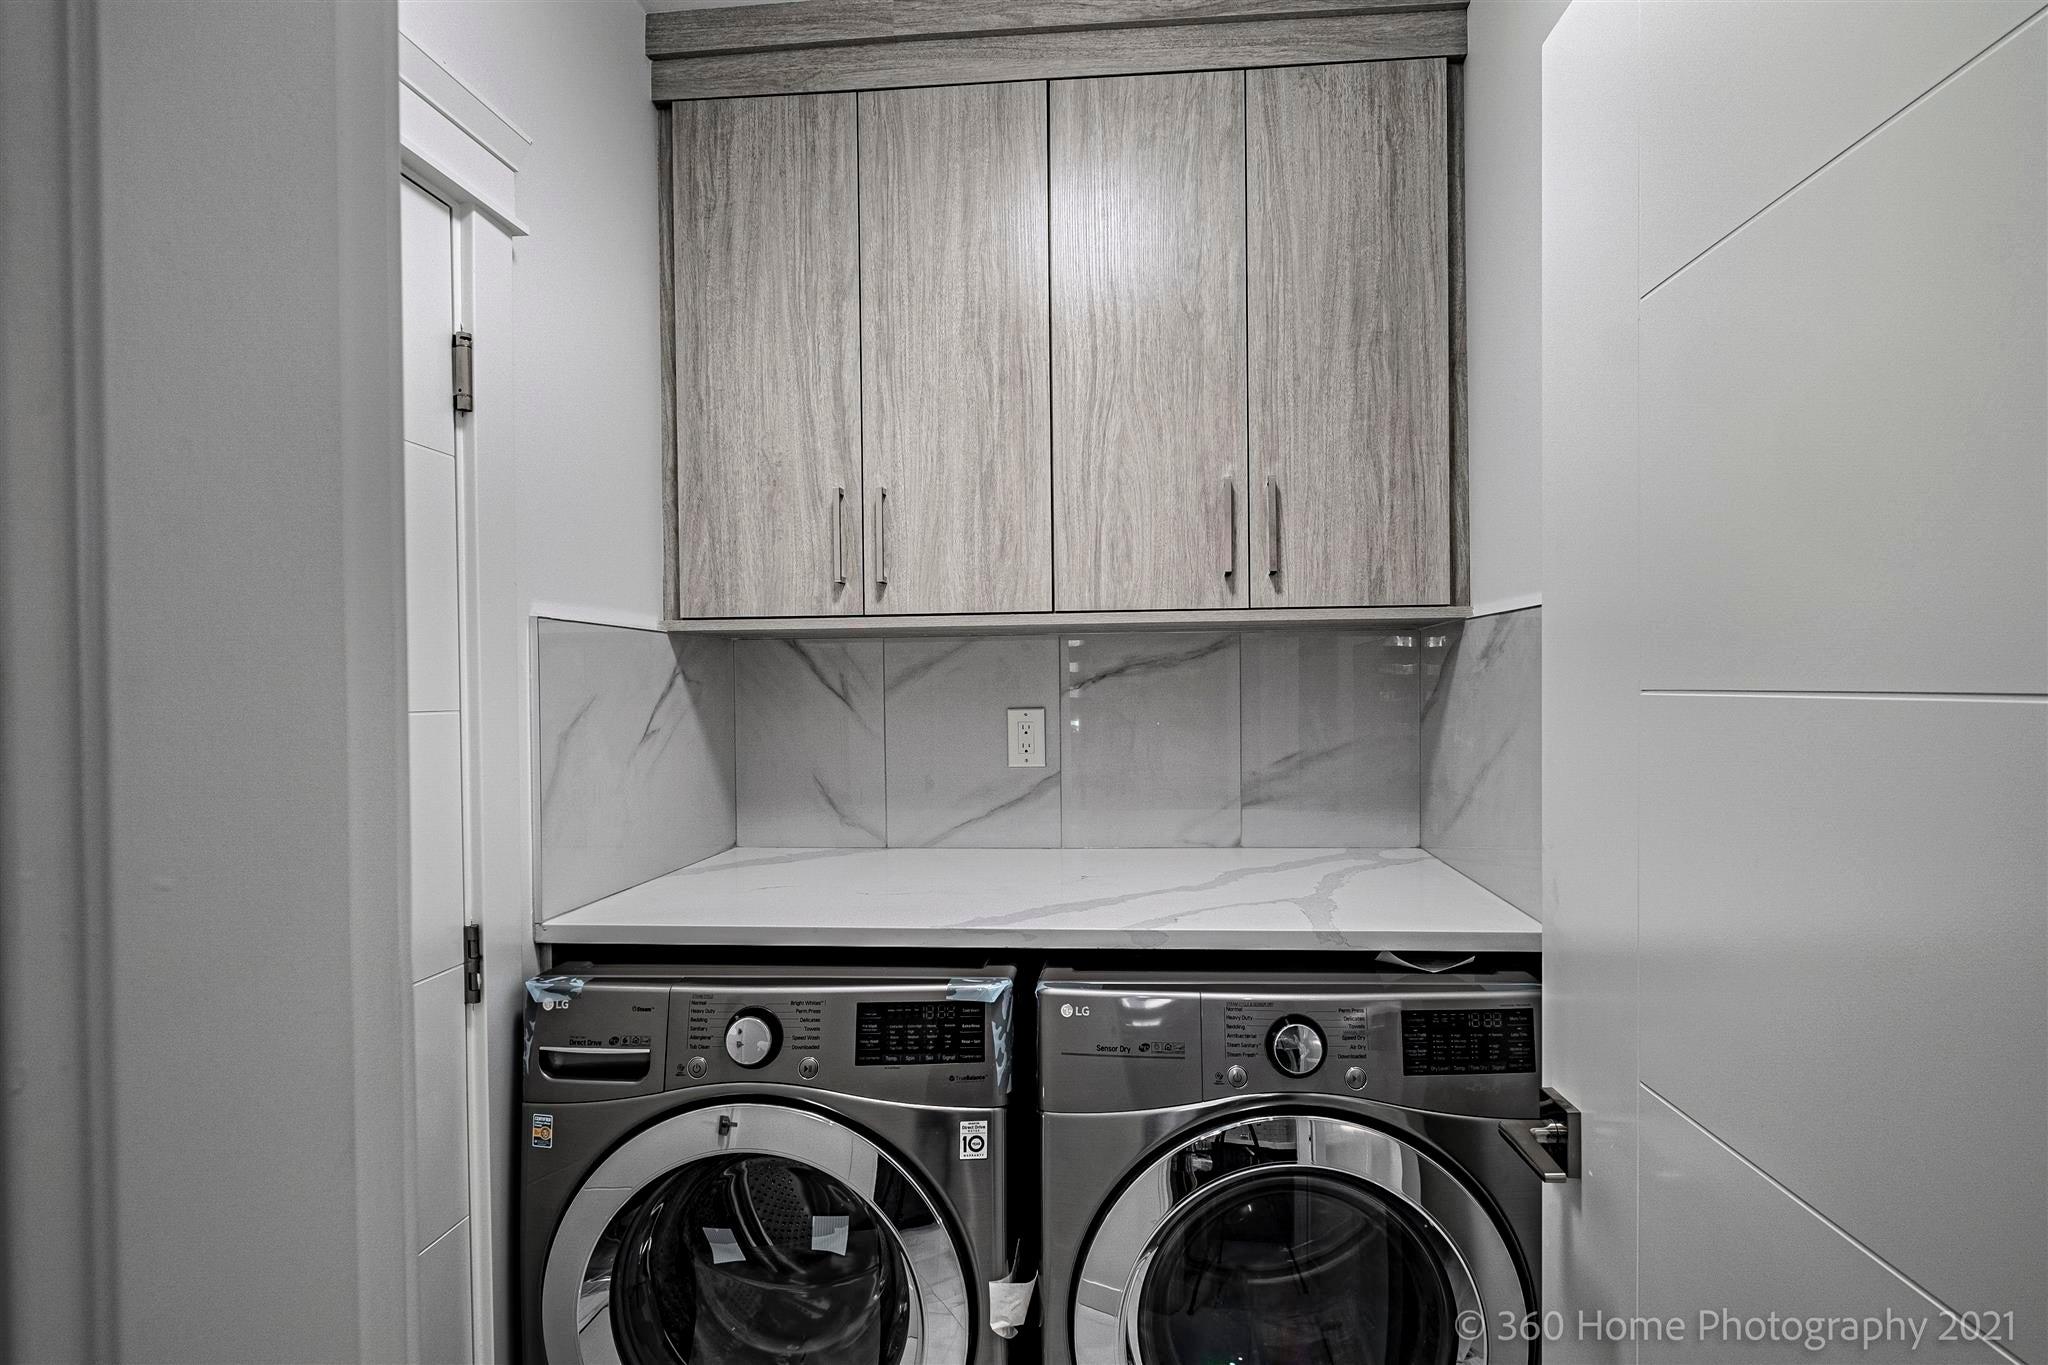 13050 101B AVENUE - Cedar Hills House/Single Family for sale, 5 Bedrooms (R2602208) - #12